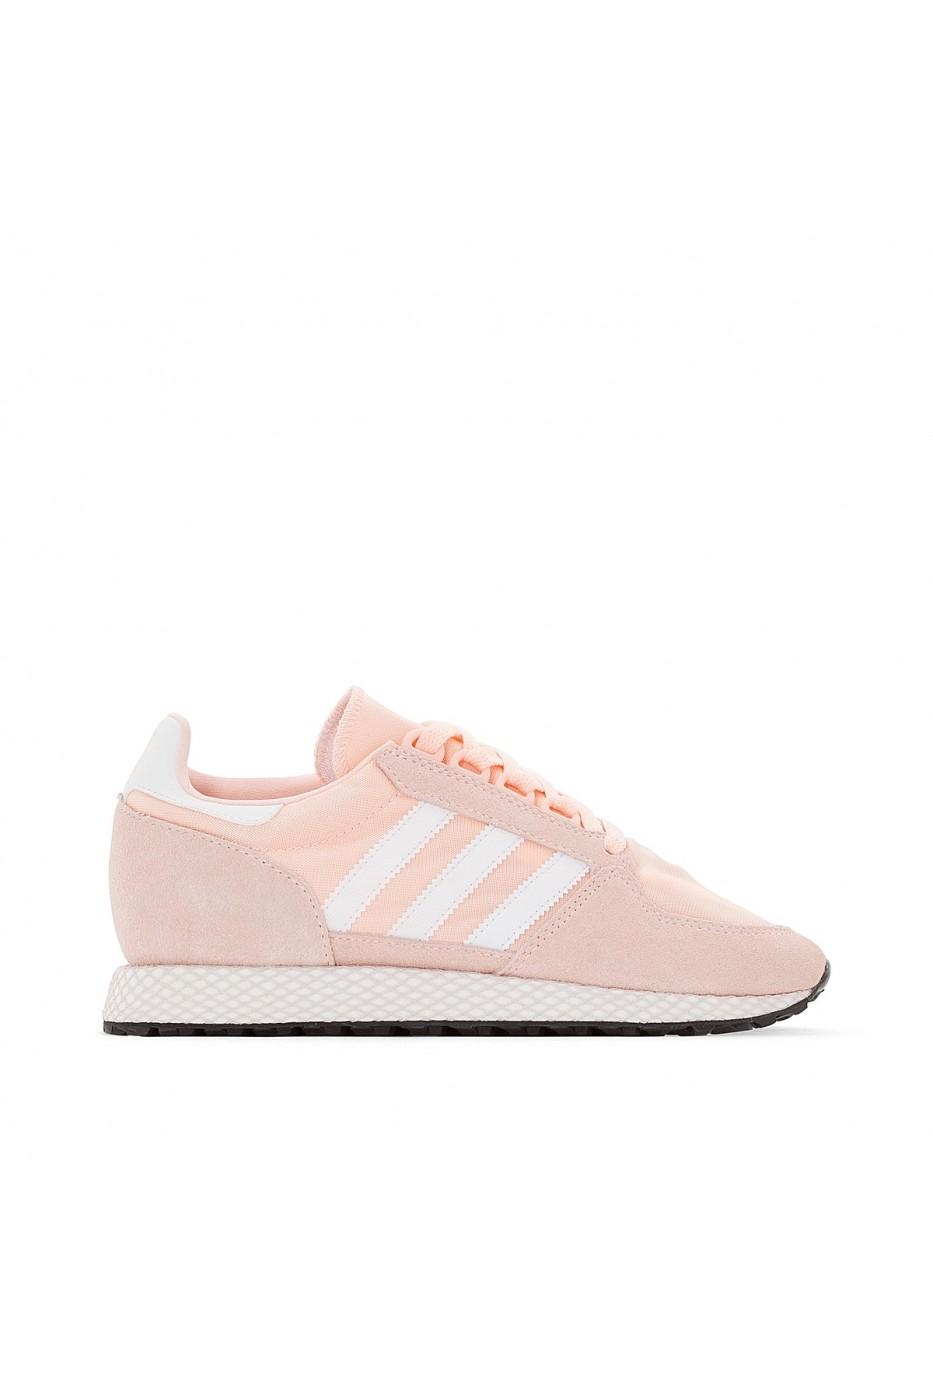 9db291a97b56 Adidas originals Sneaker cipő LRD-GEY460-pink-grey Rózsaszín ...